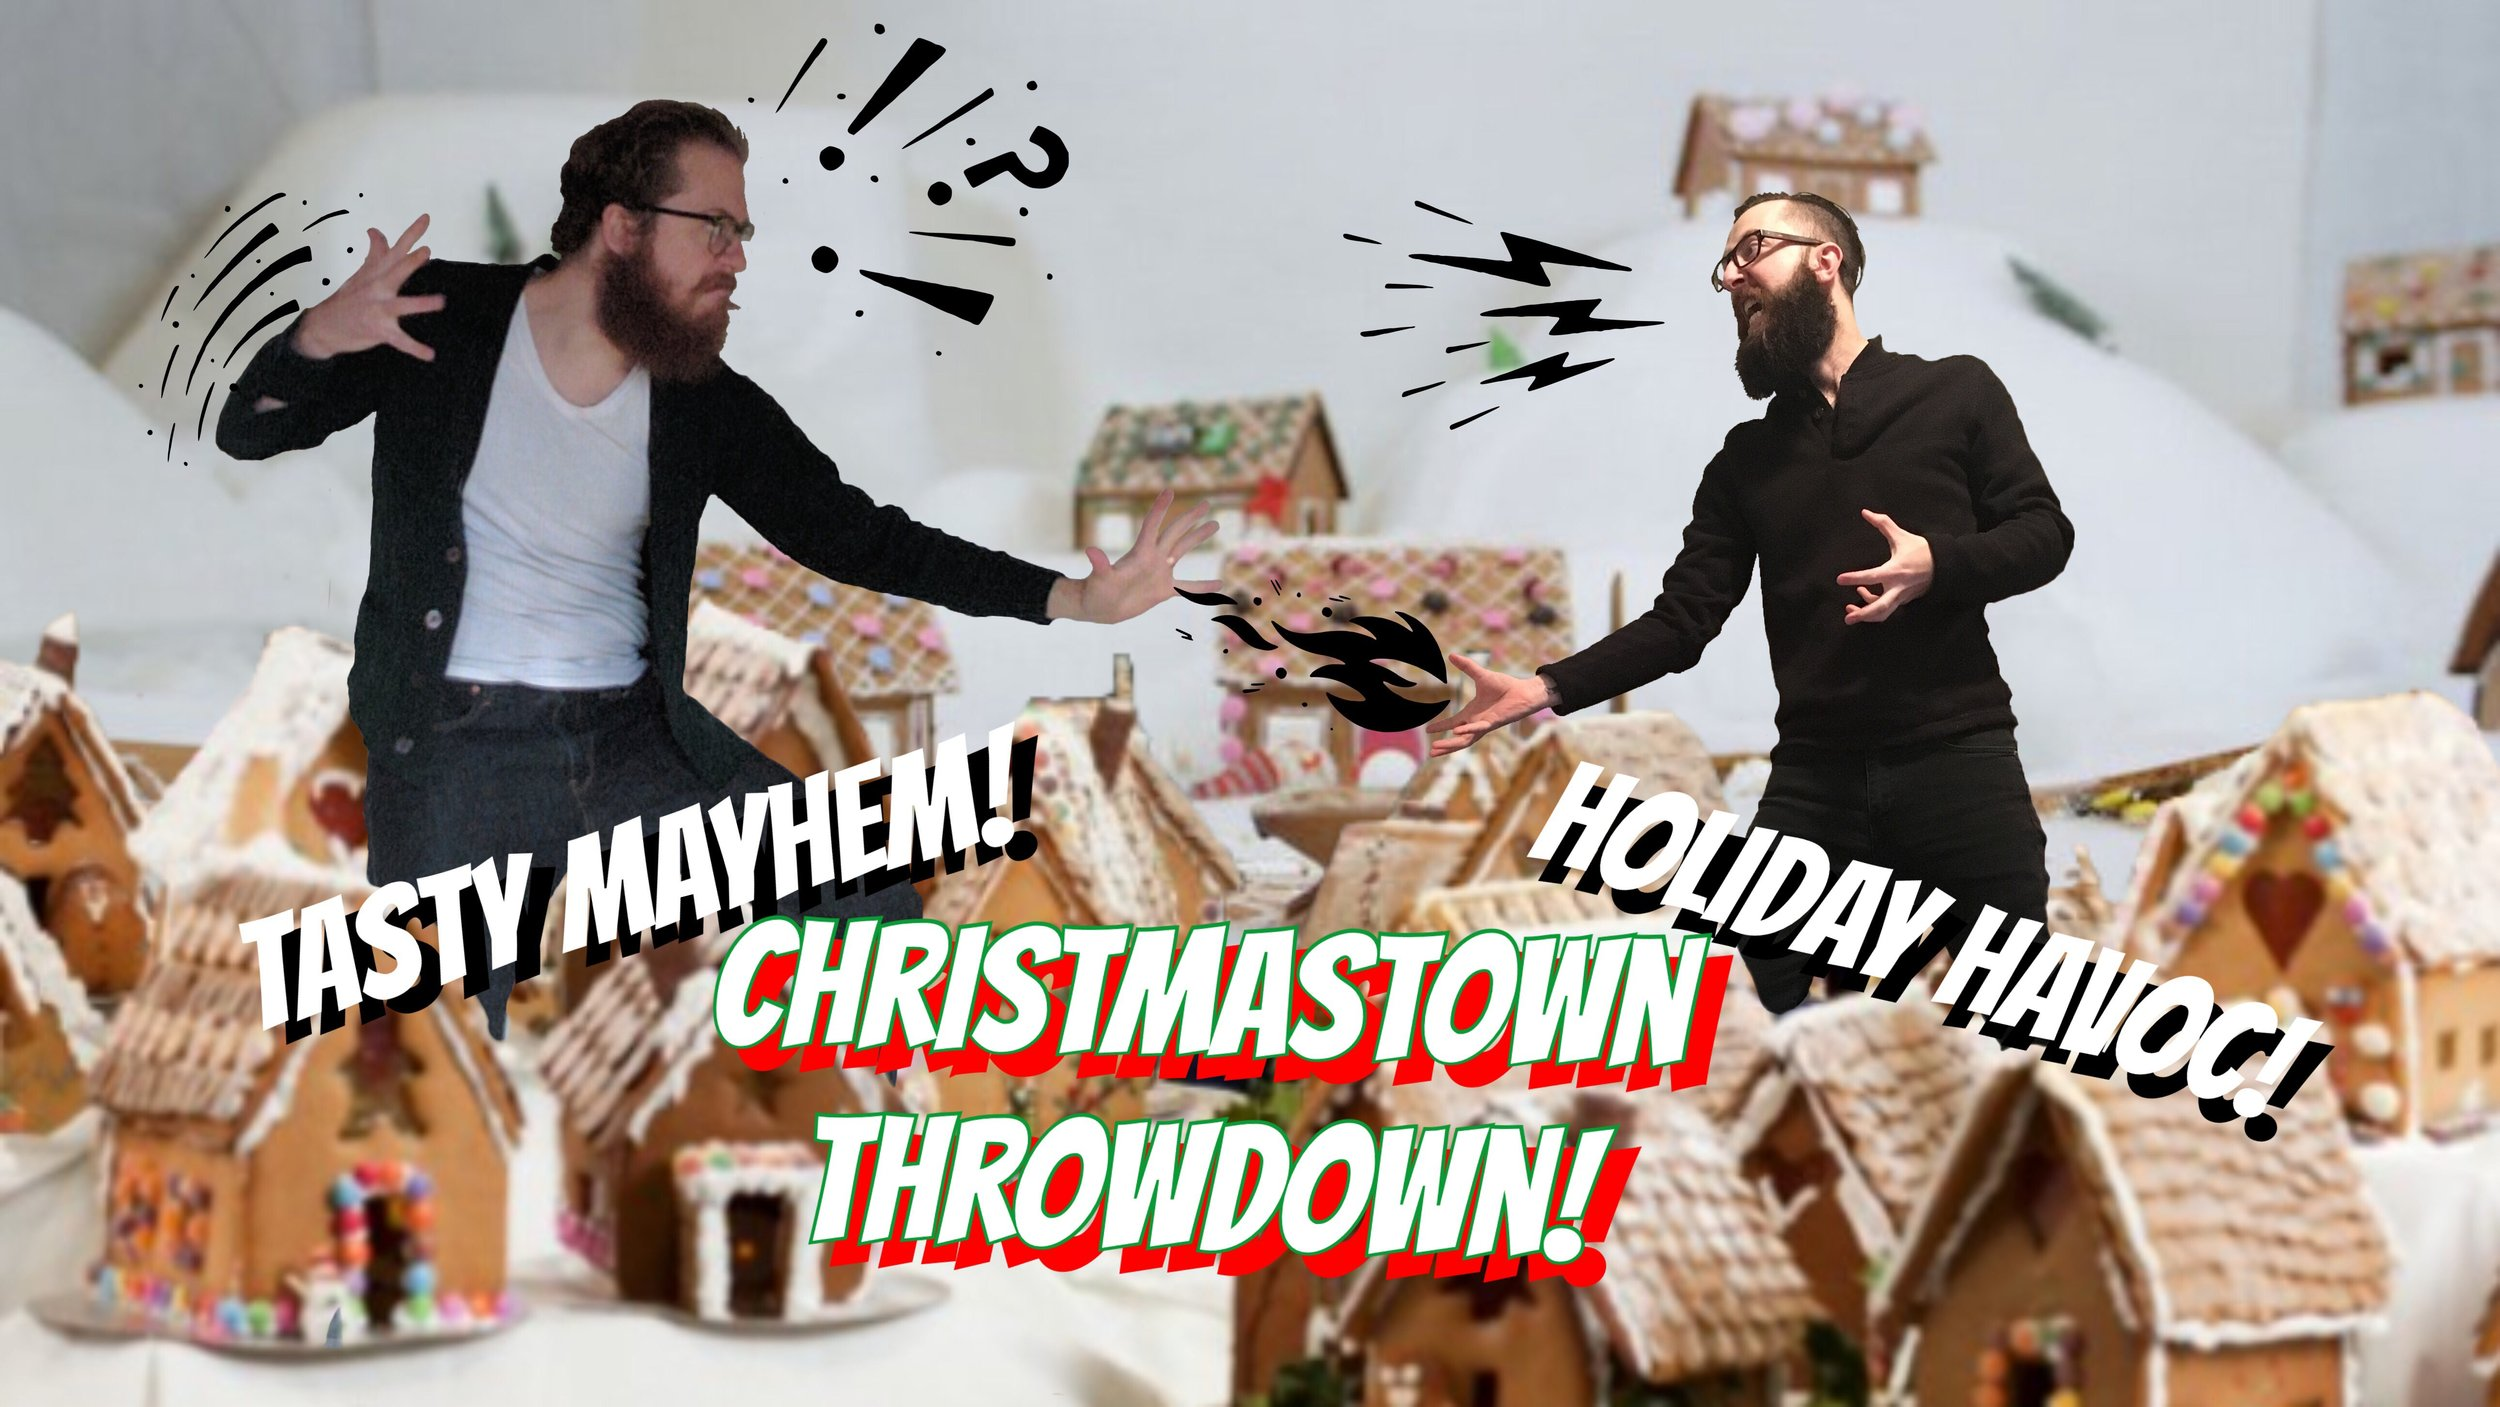 Christmas Throwdown.jpg